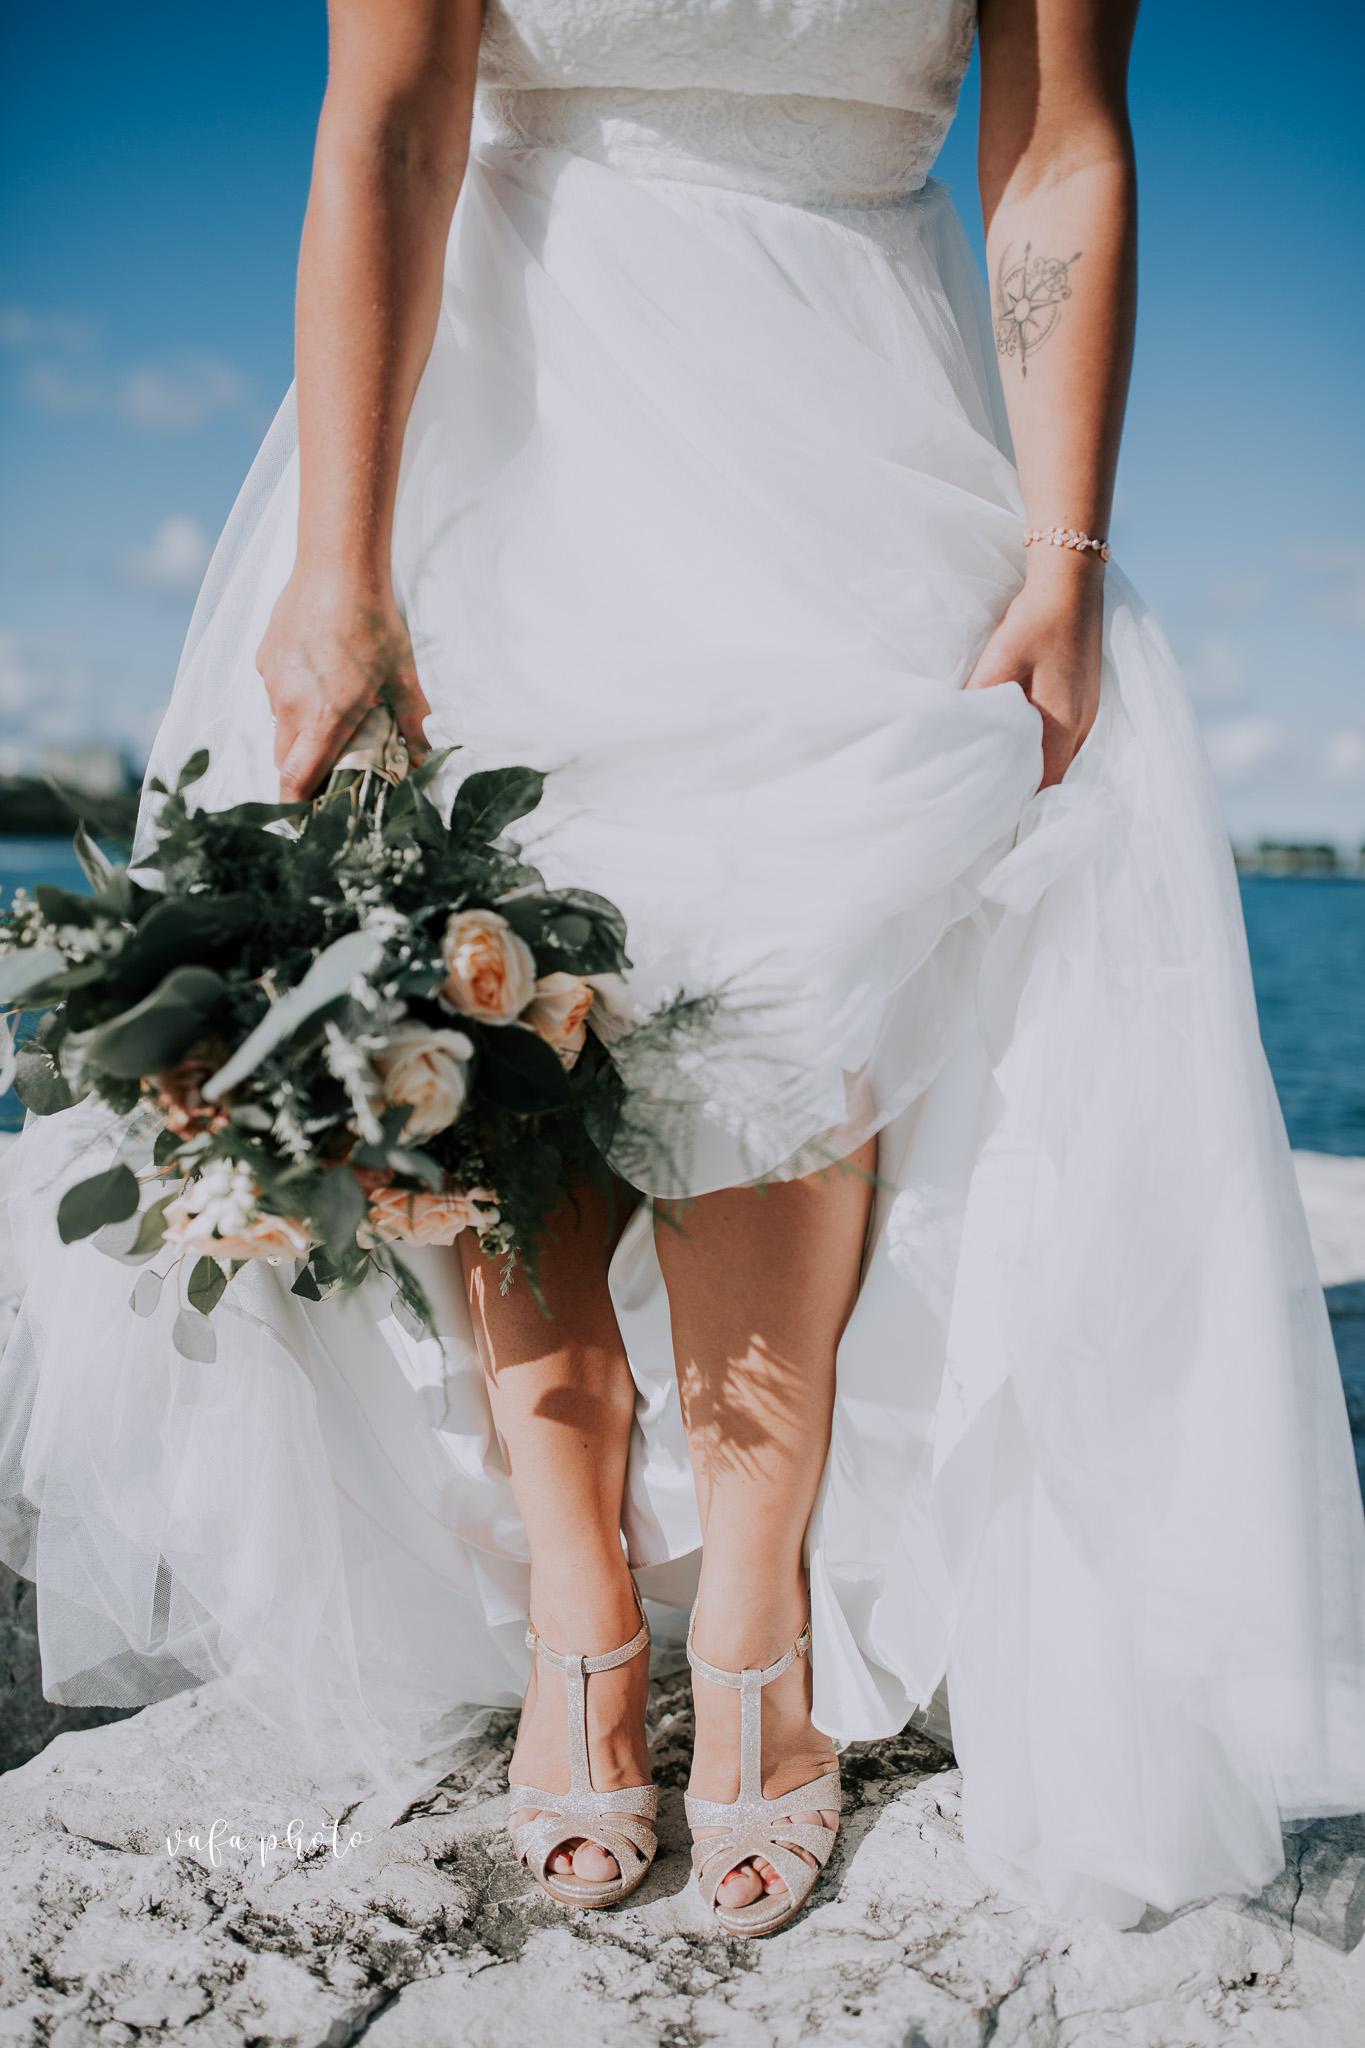 Milwaukee-Athletic-Club-Wedding-Amanda-Tony-Vafa-Photo-610.jpg